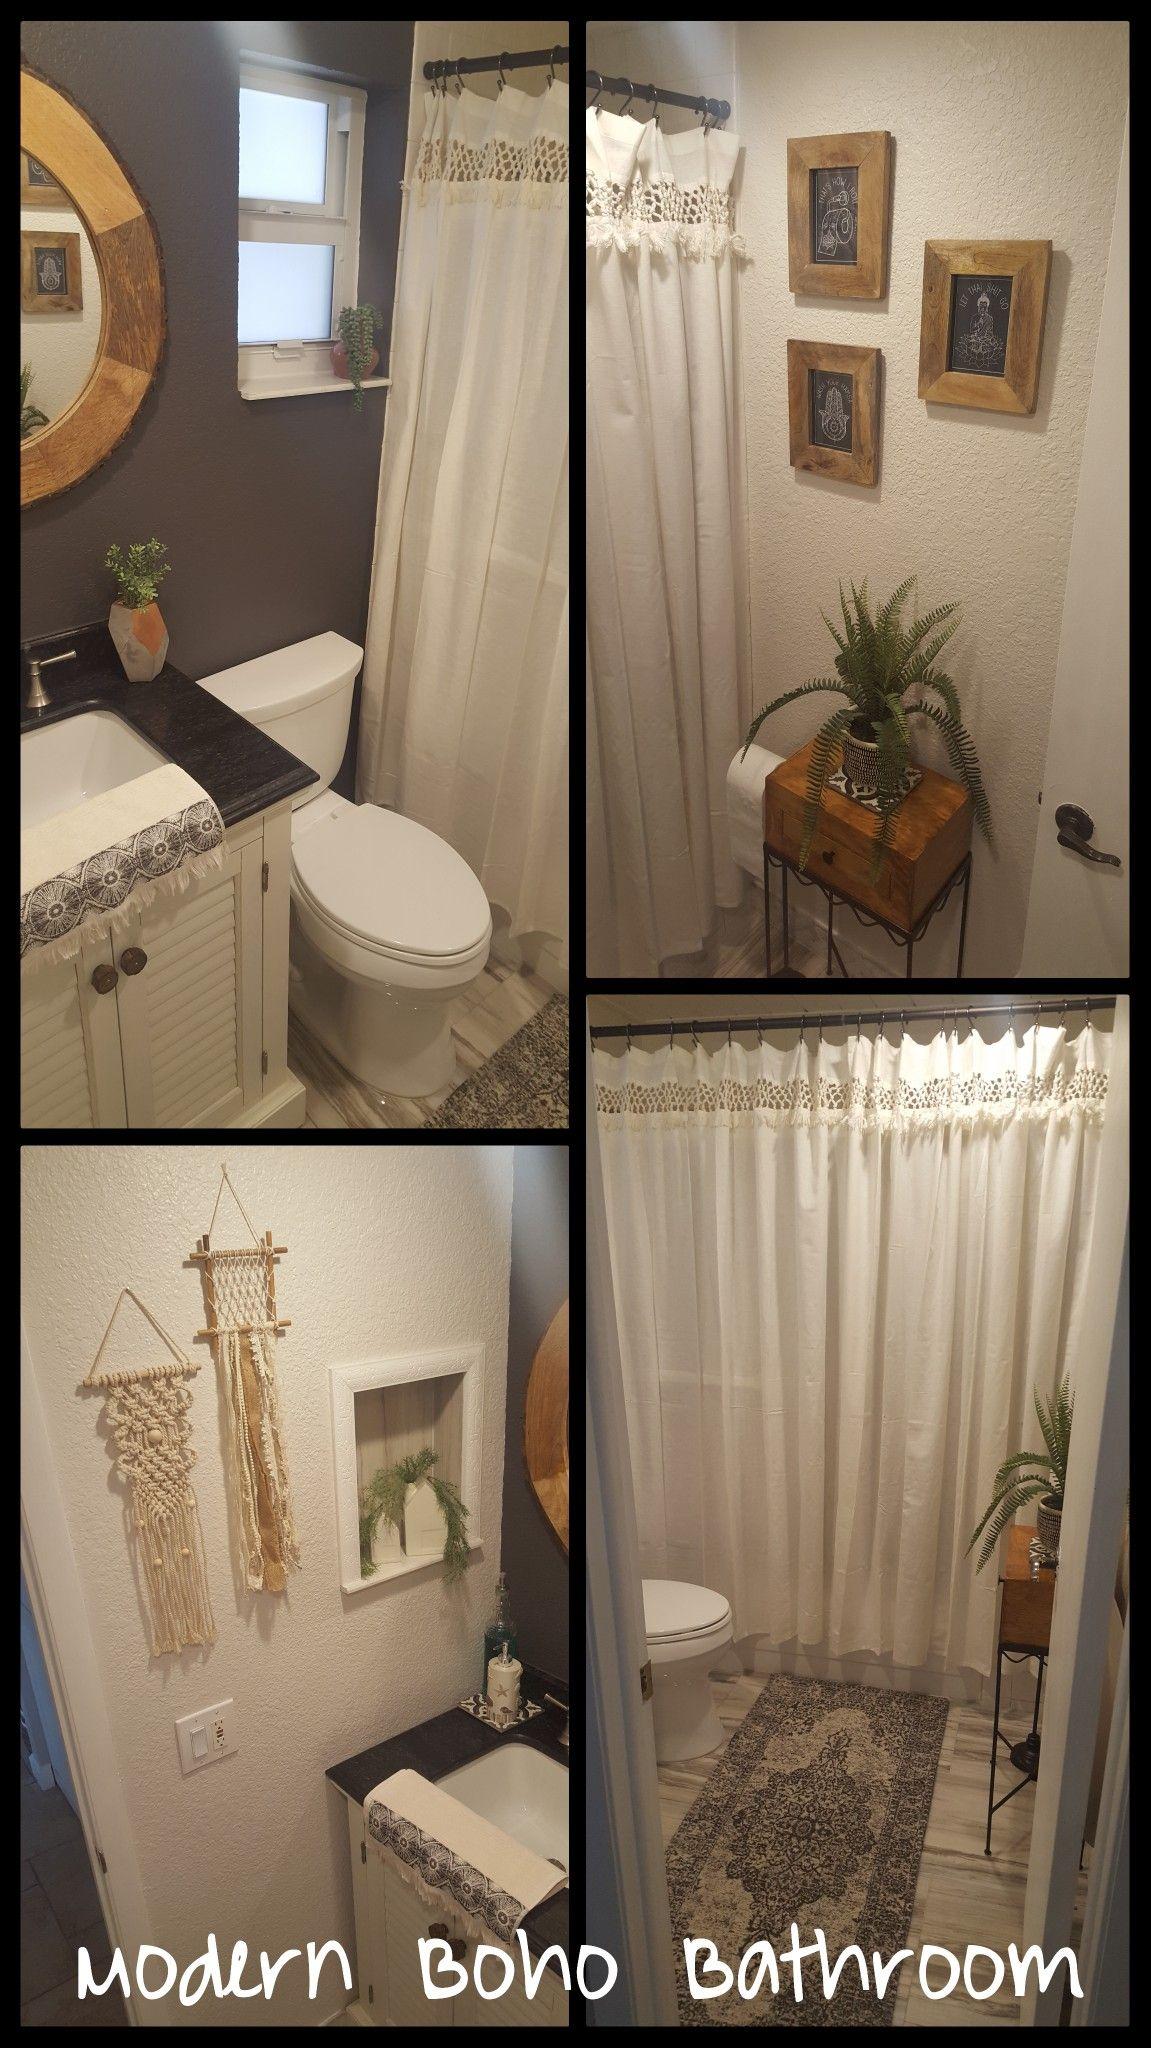 This Is A Modern Bohemian Bathroom Diy Decor Bathroom Redo With Macrame Wall Hanging Decor A Macrame Modern Shower Curtains Modern Boho Bathroom Boho Bathroom